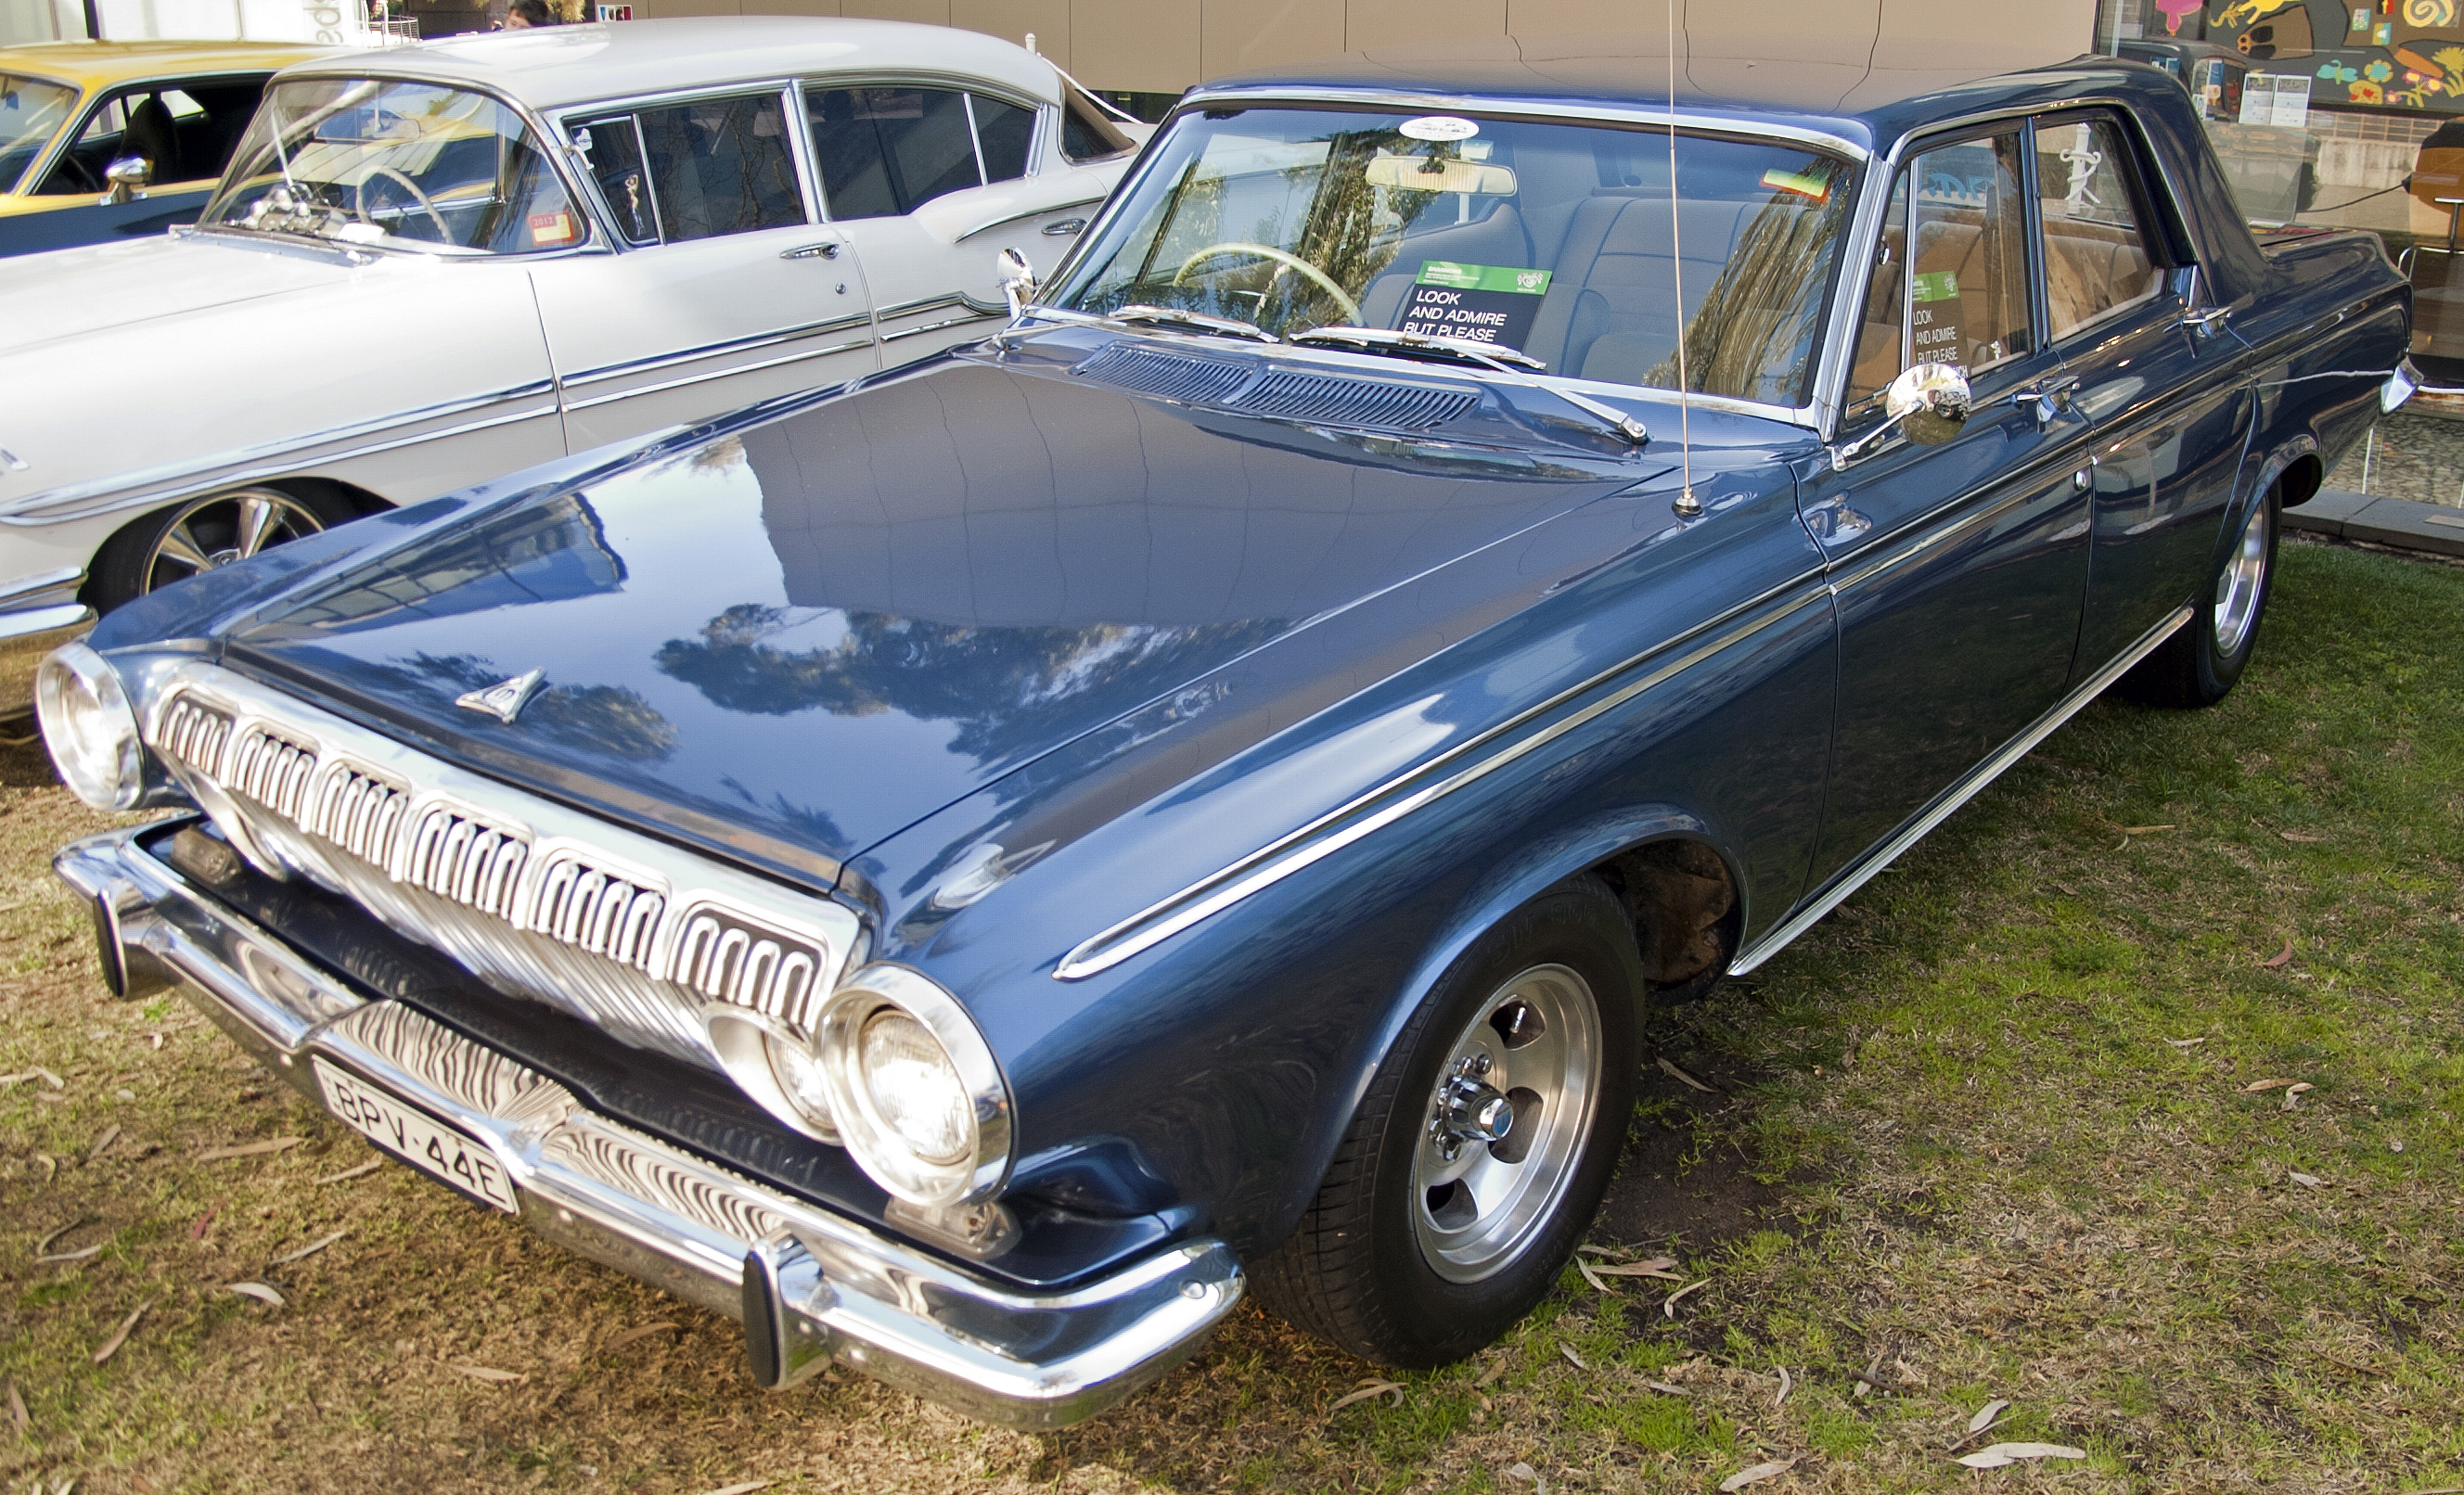 Dodge Build Your Own >> File:1963 Dodge Phoenix.jpg - Wikimedia Commons